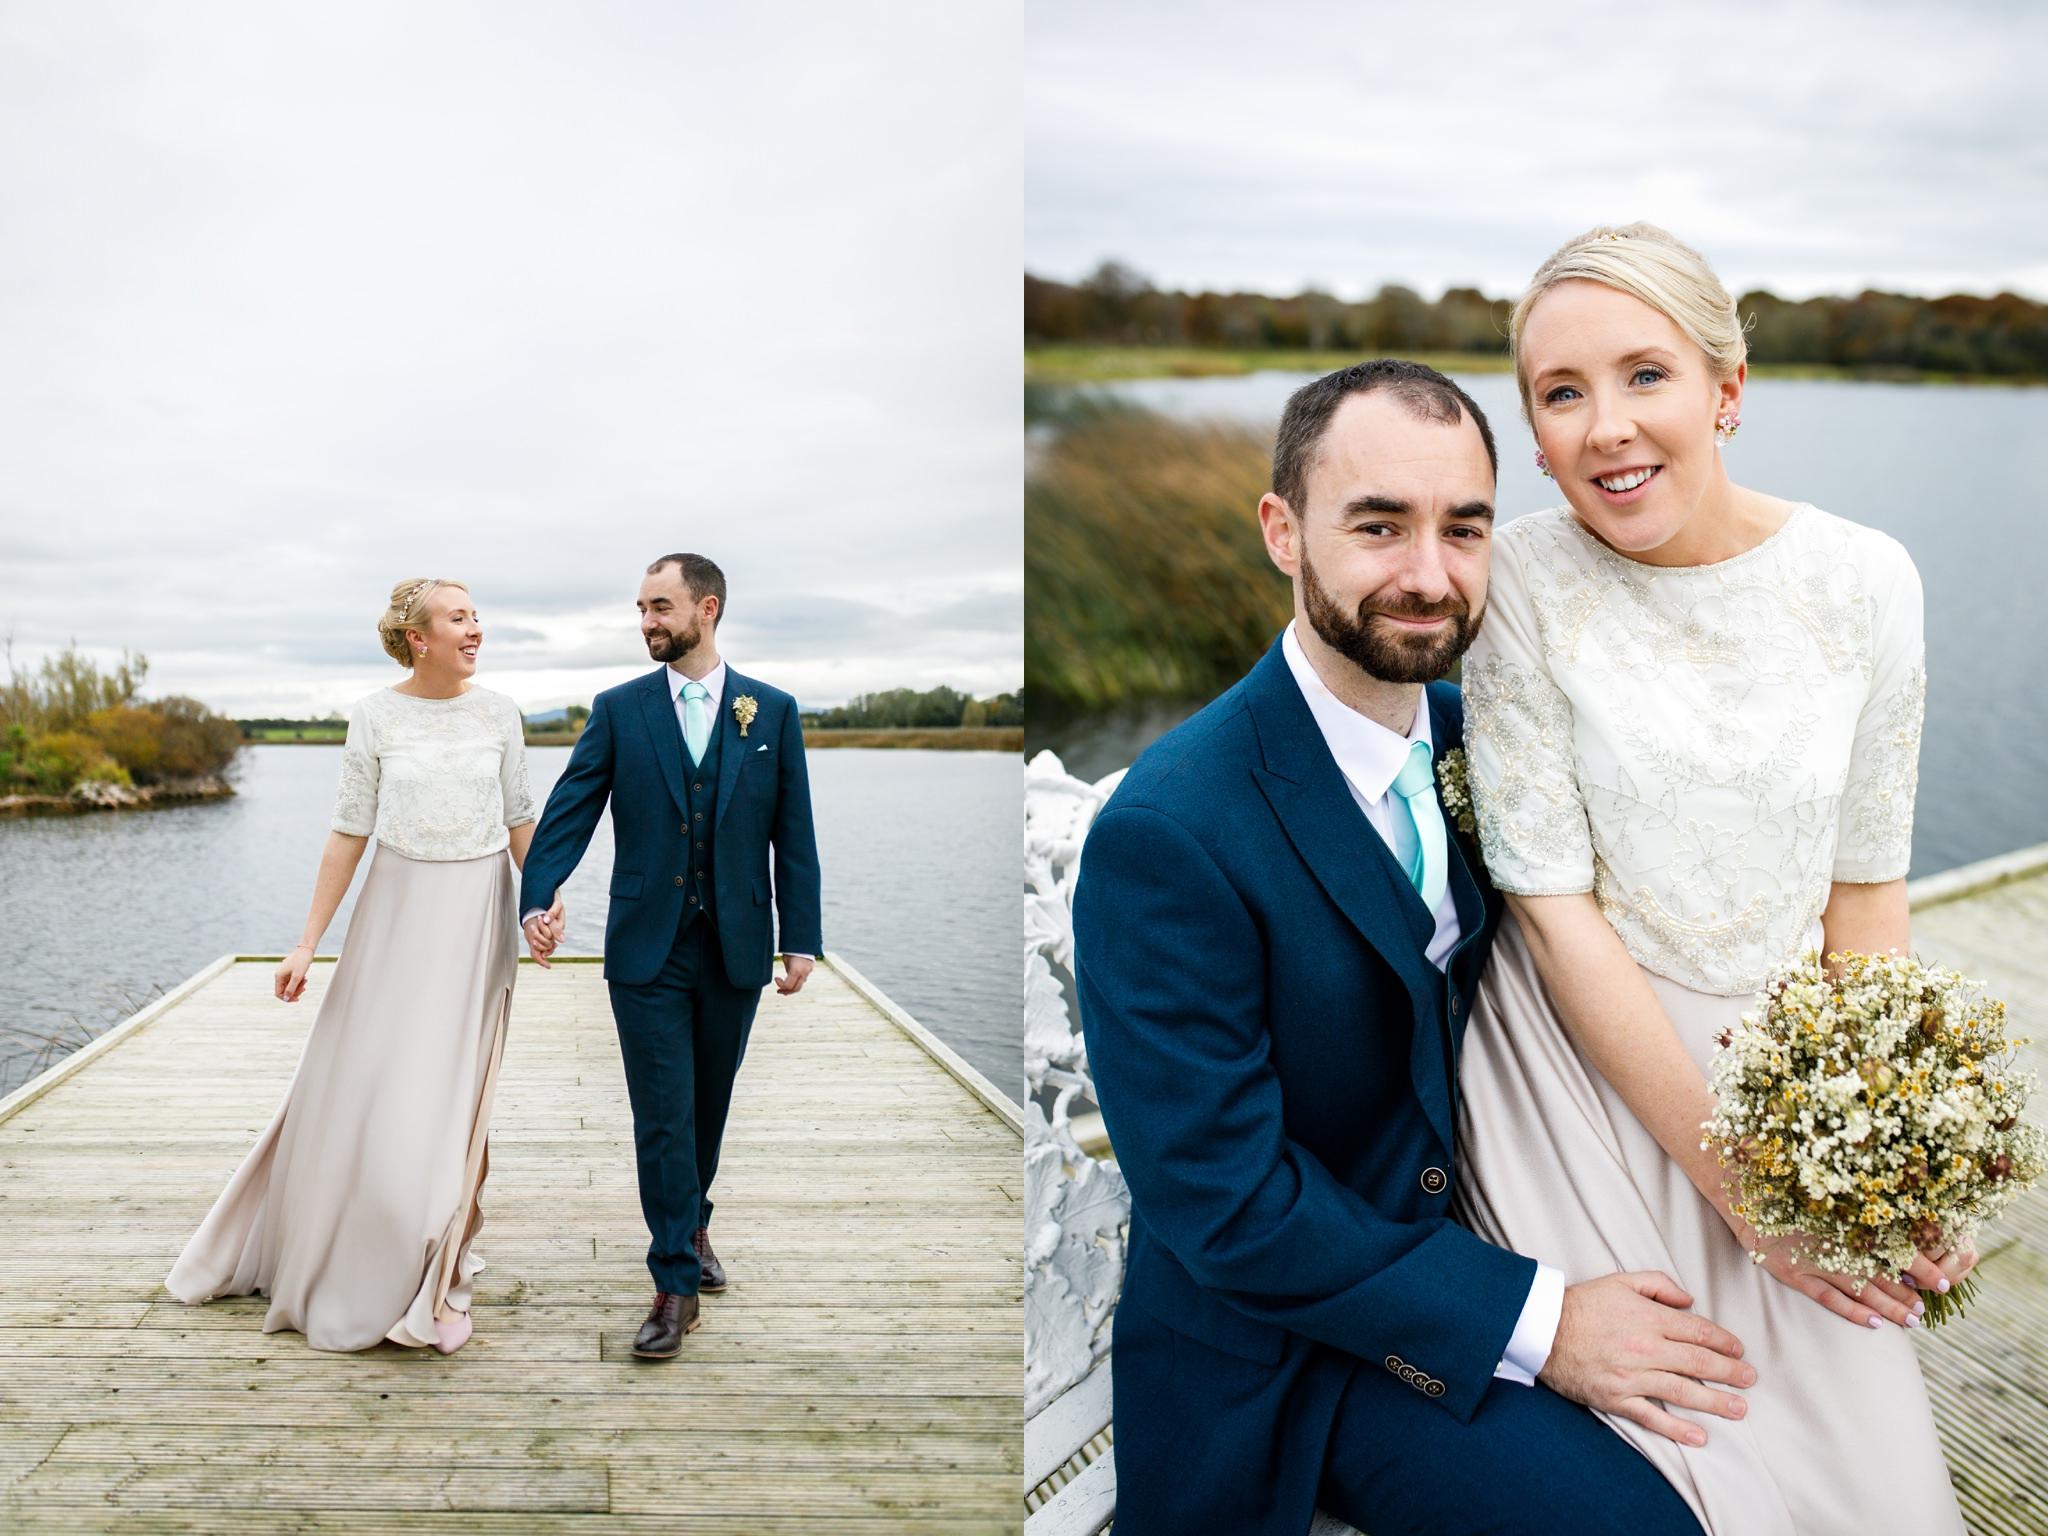 Elisha-Clarke-Photography-Dublin-City-Wedding_0088.jpg